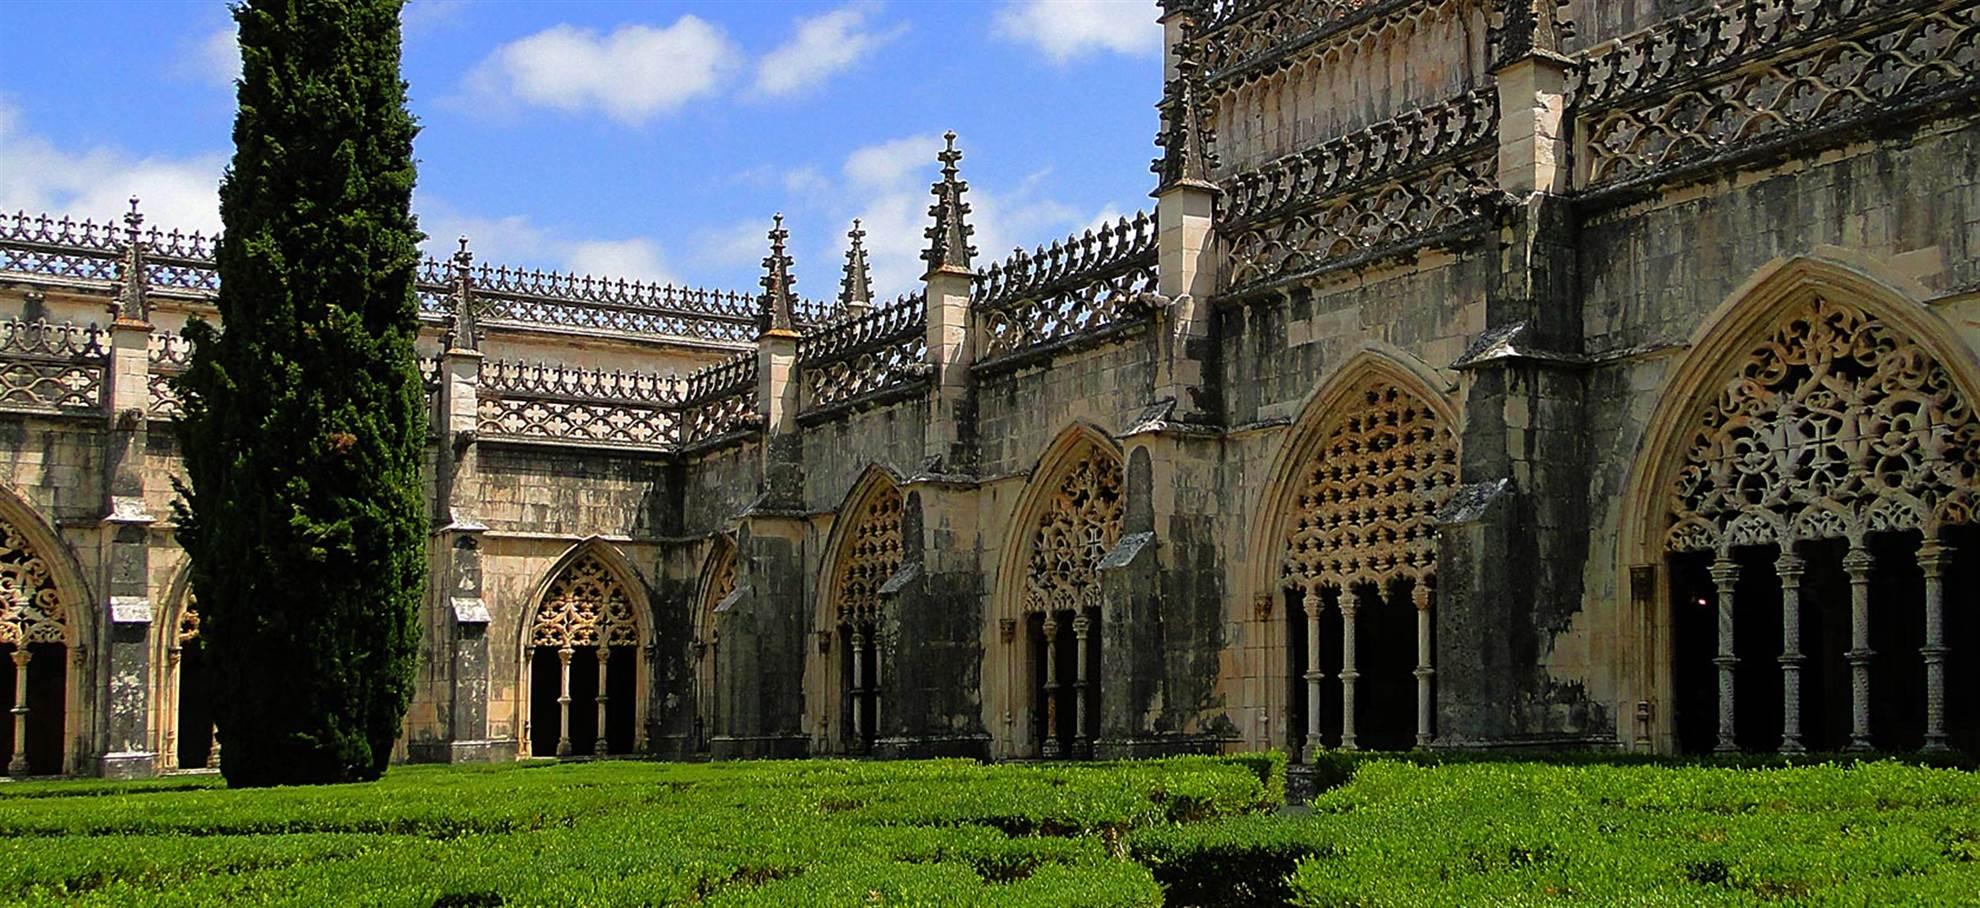 Jerónimos Monastery - Монастырь Иеронимитов